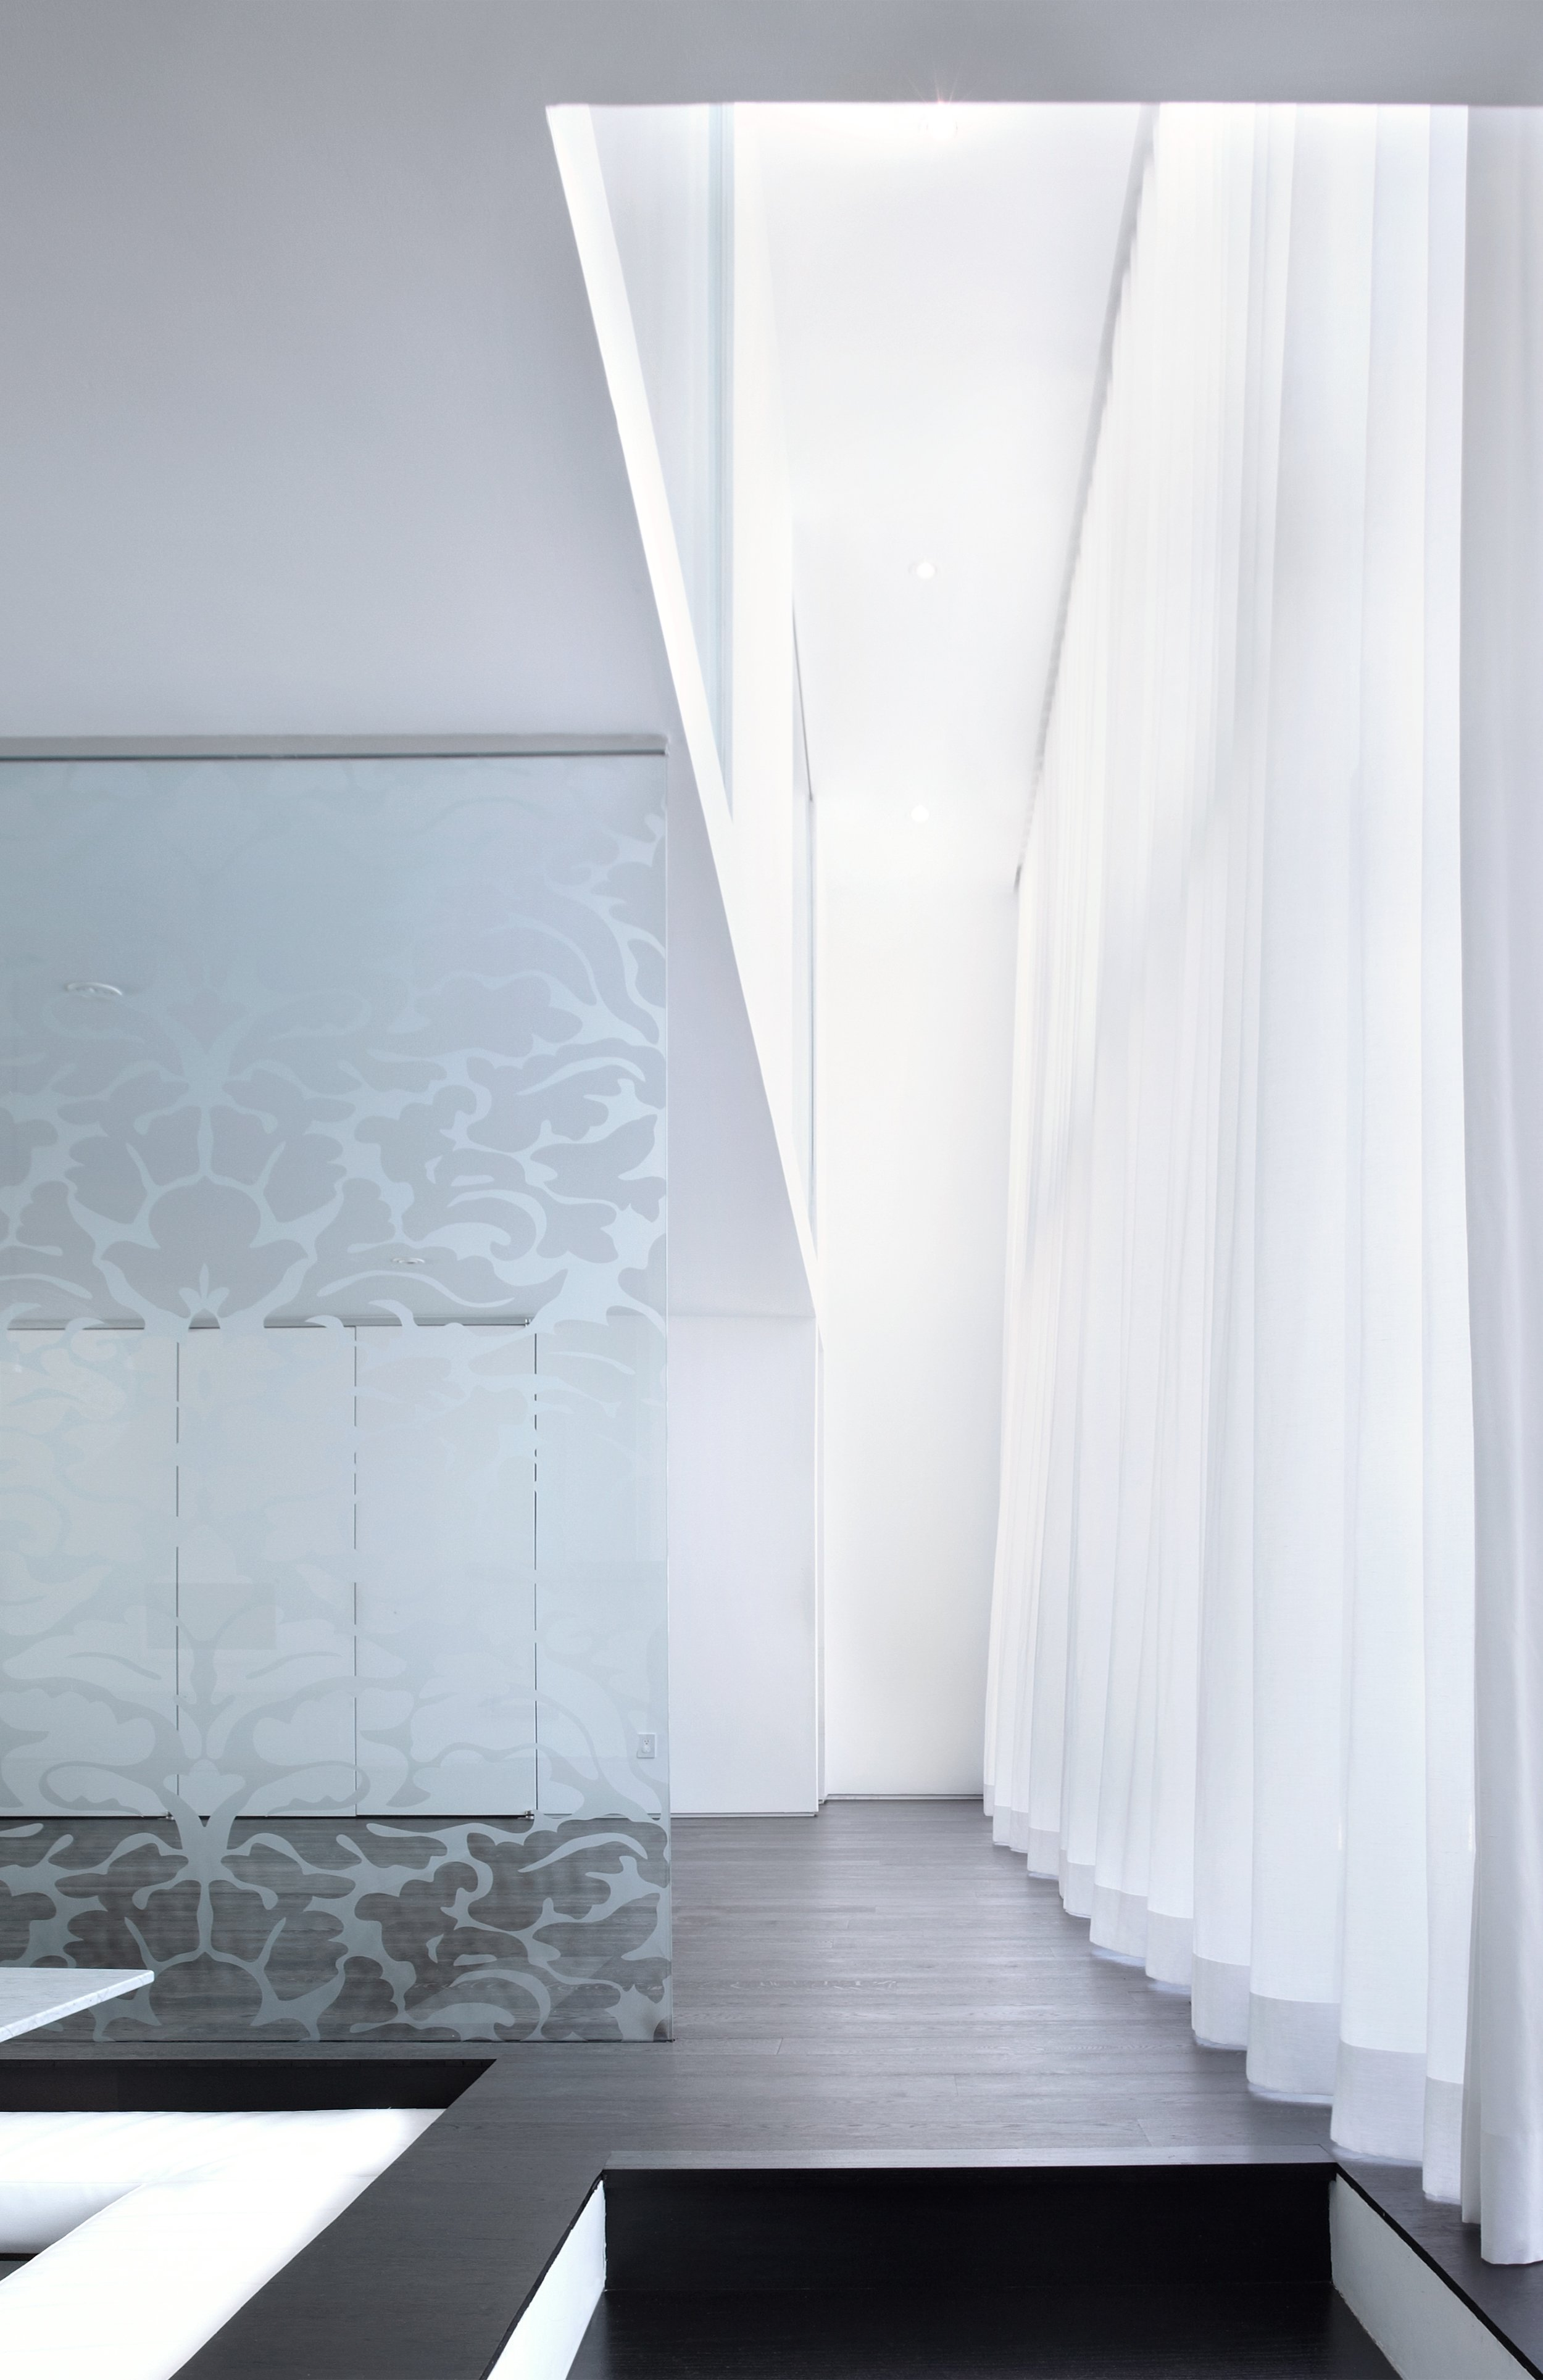 House 60 - back wall two storey pattern glass